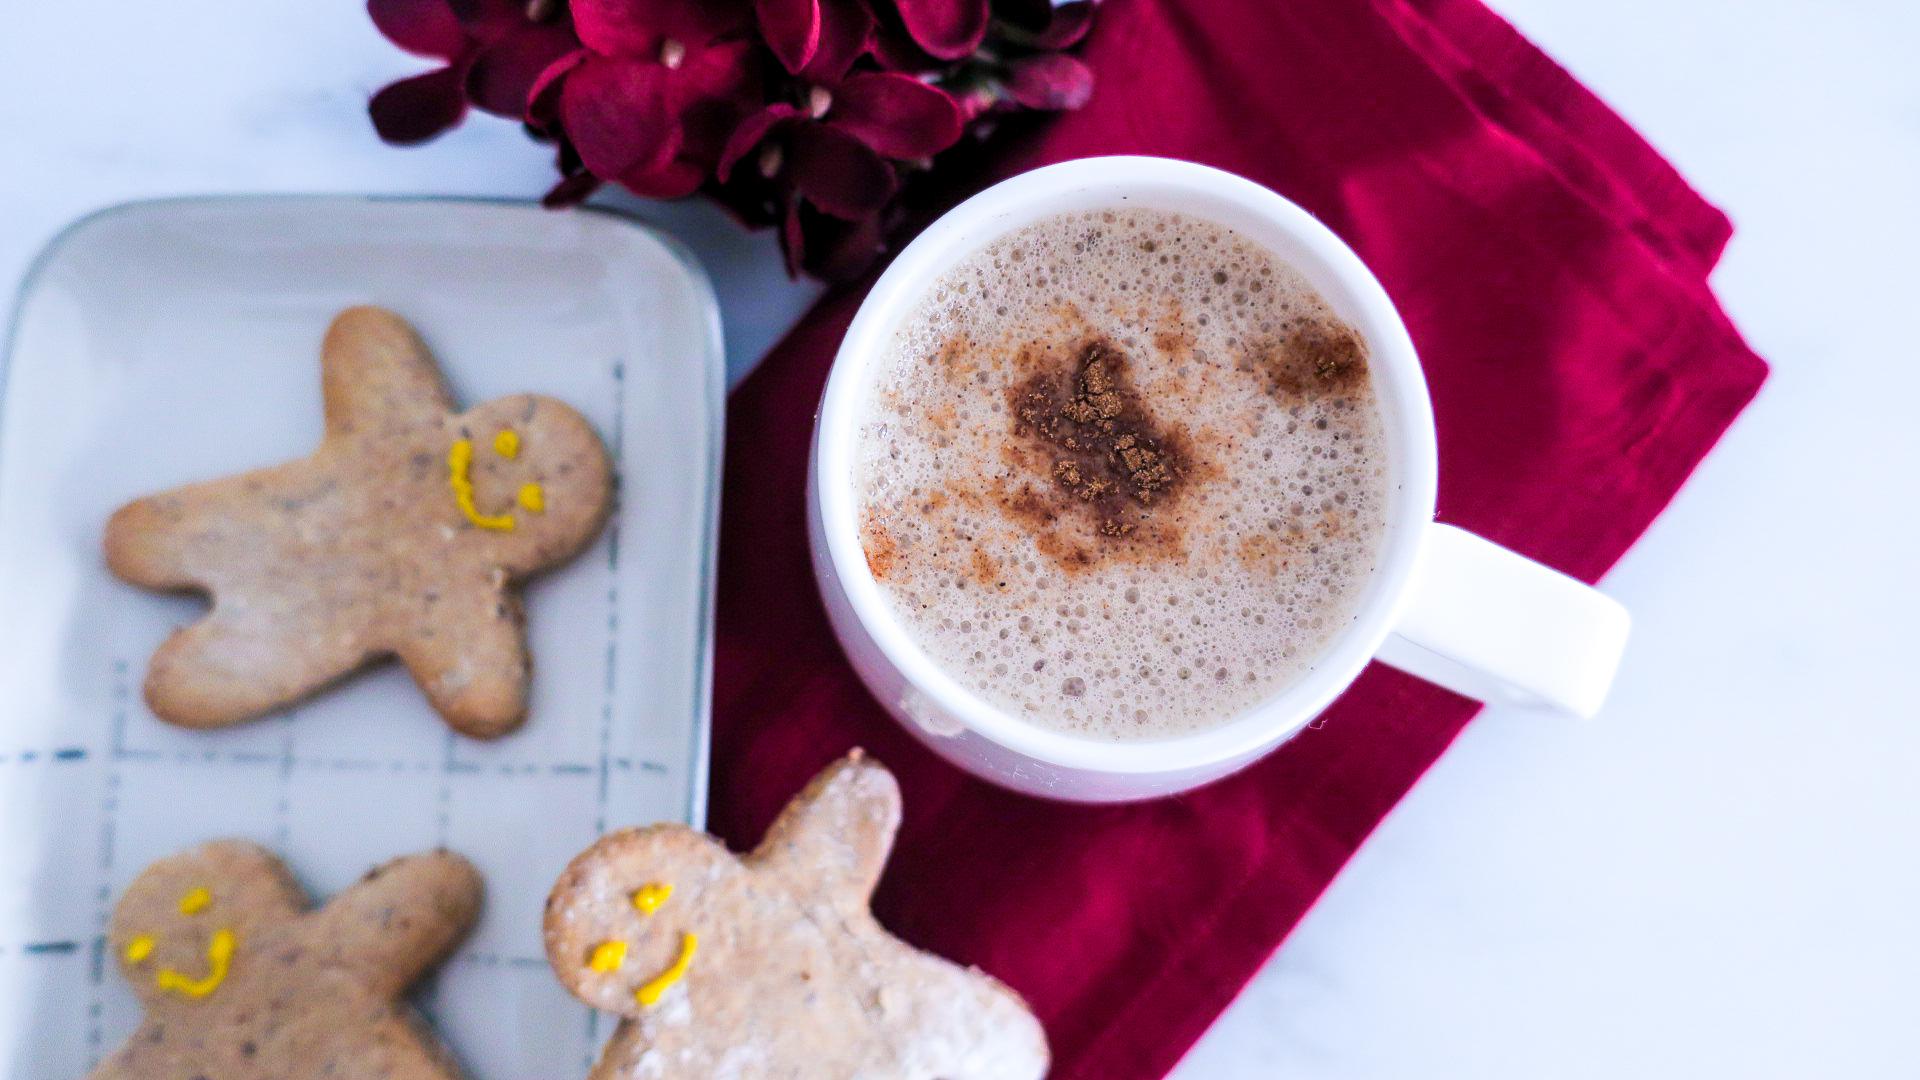 Vegane Spekulatius Chocolate Latte #vegan #healthy #recipe #christmas #spekulatius #chocolate #latte #plantbased #gesund #einfach #easy #veganerezepte #veganelatte